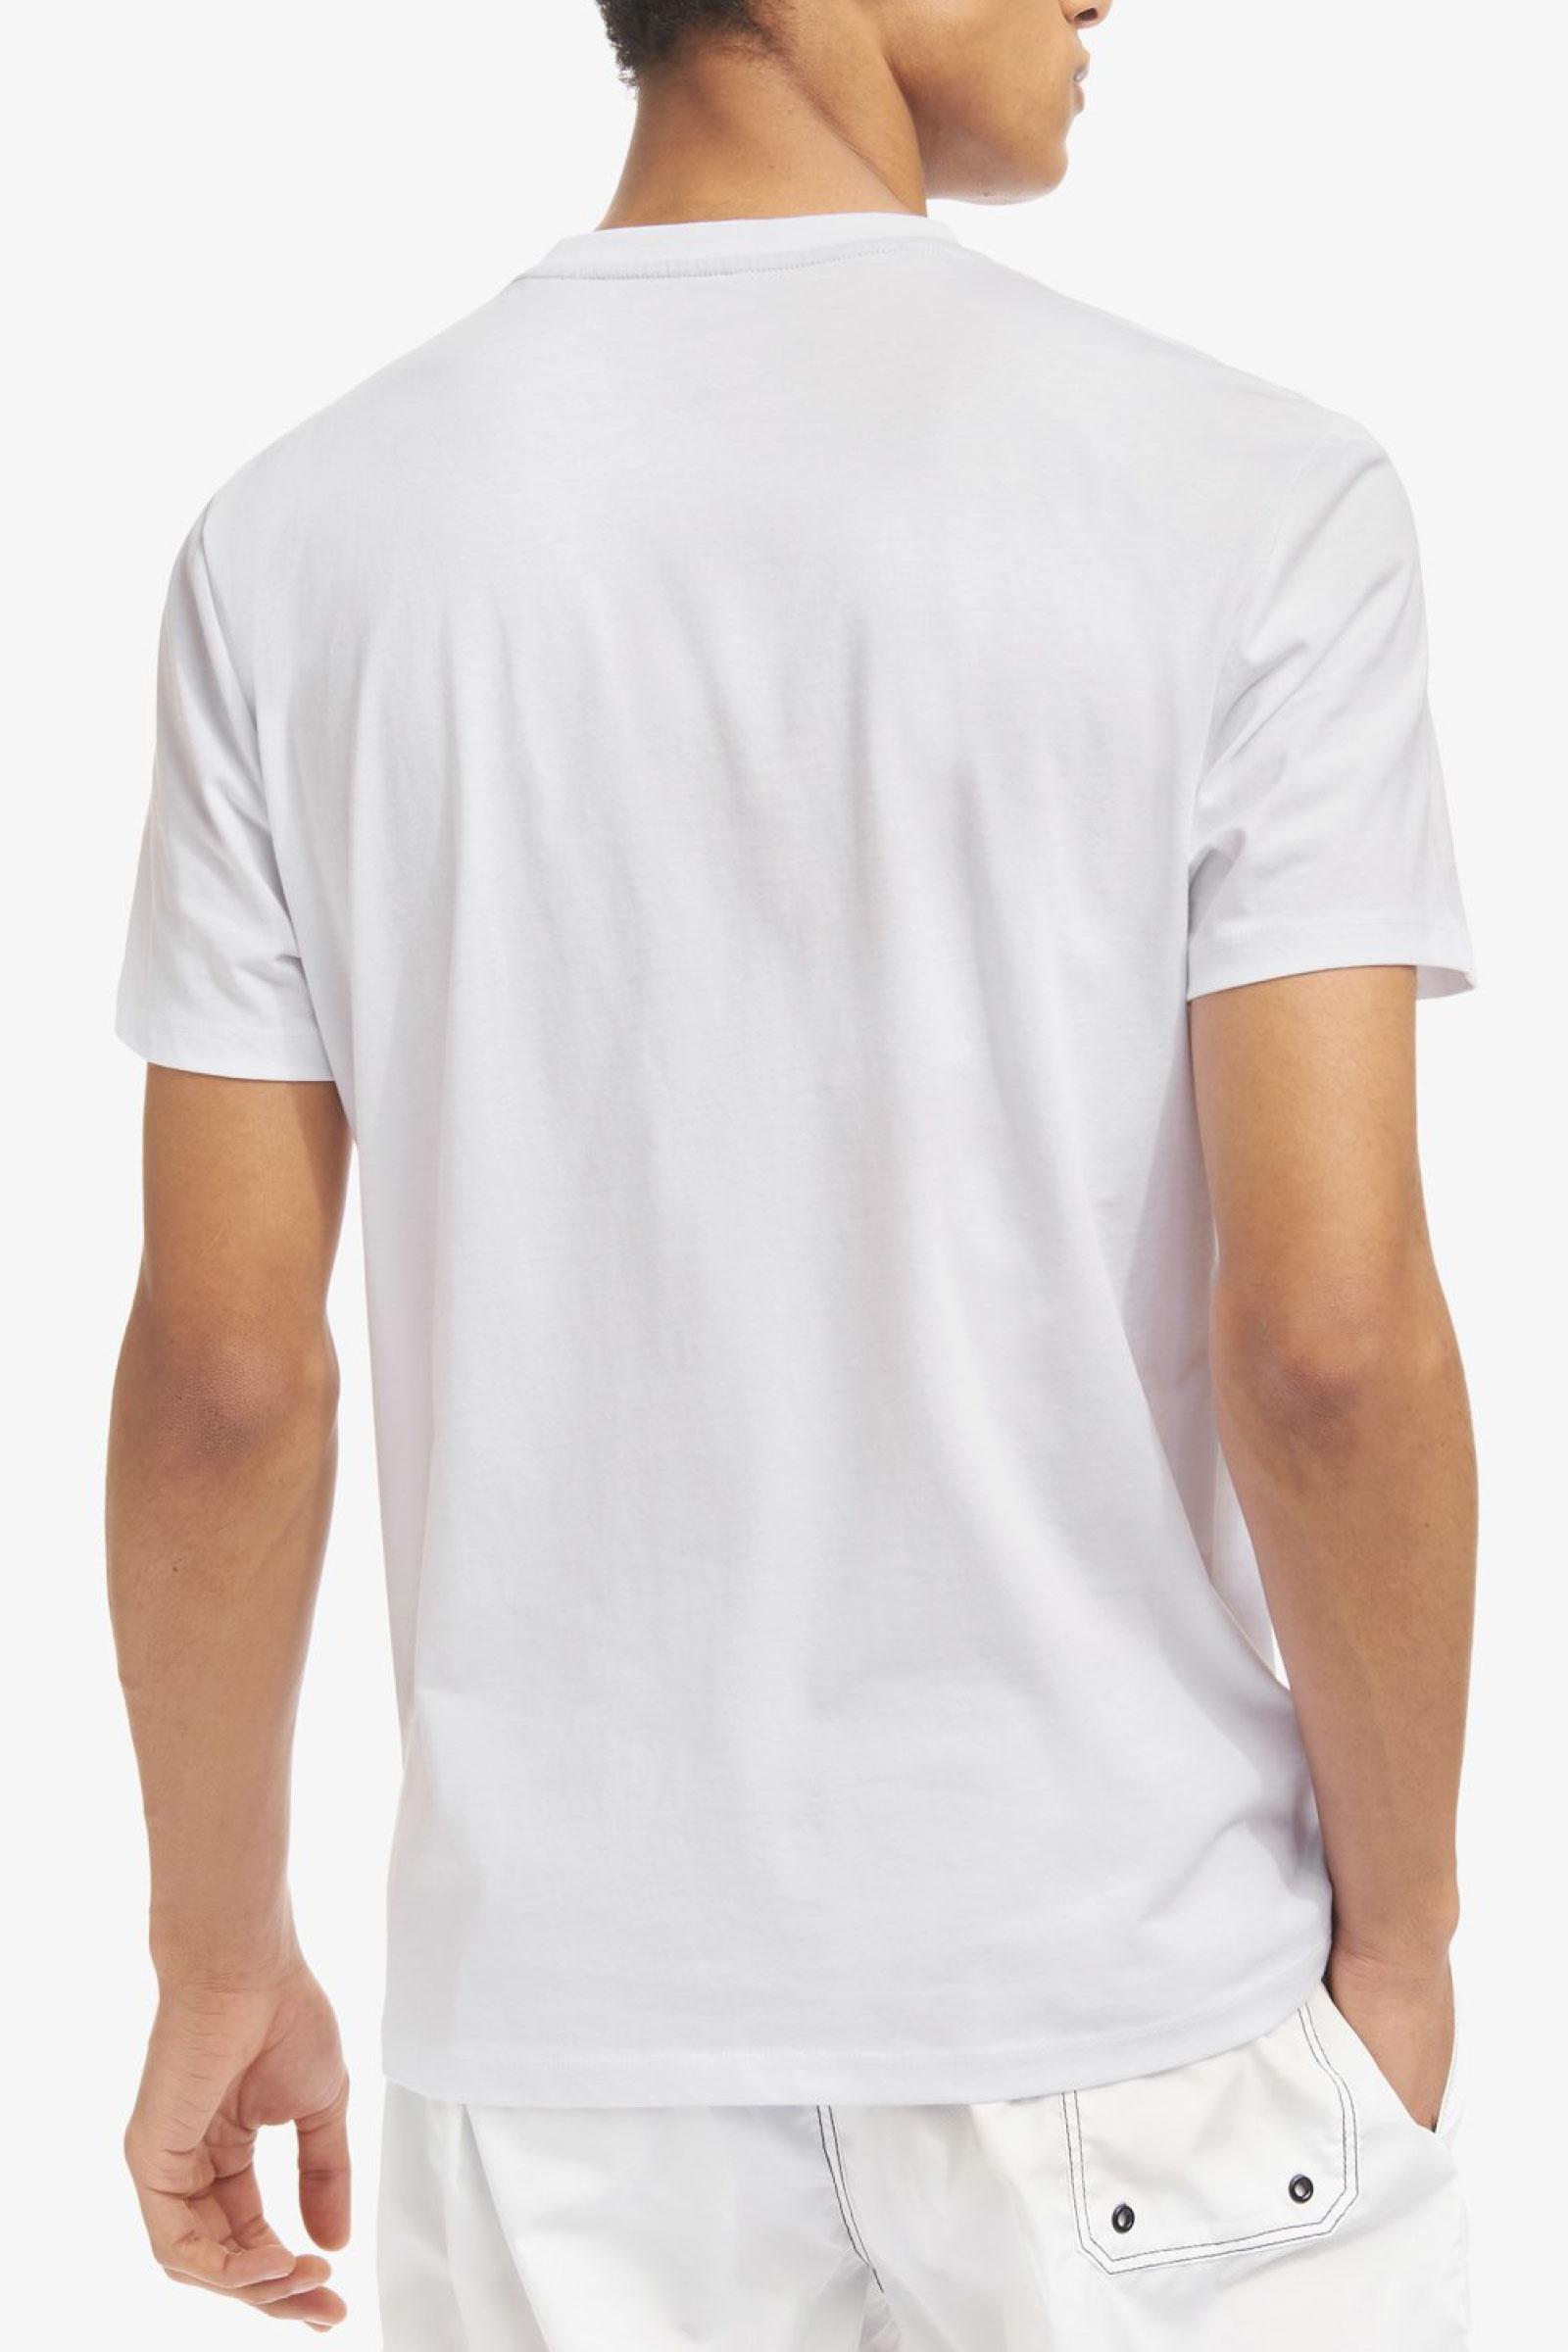 BLAUER T-Shirt Uomo BLAUER | T-Shirt | 21SBLUH02334100